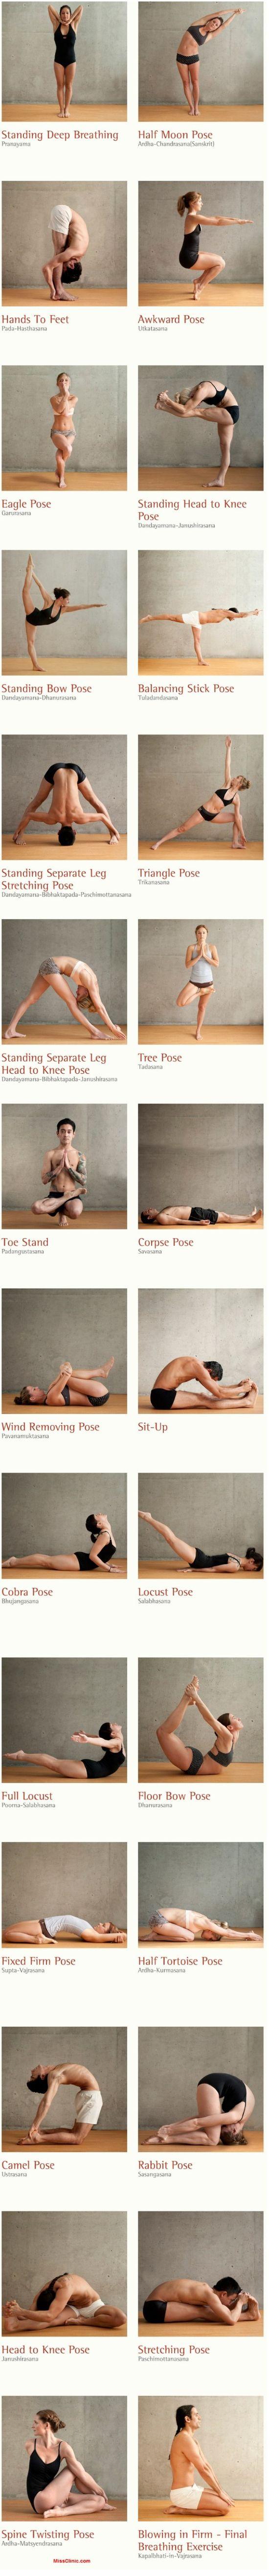 26 Healthy Yoga Postures